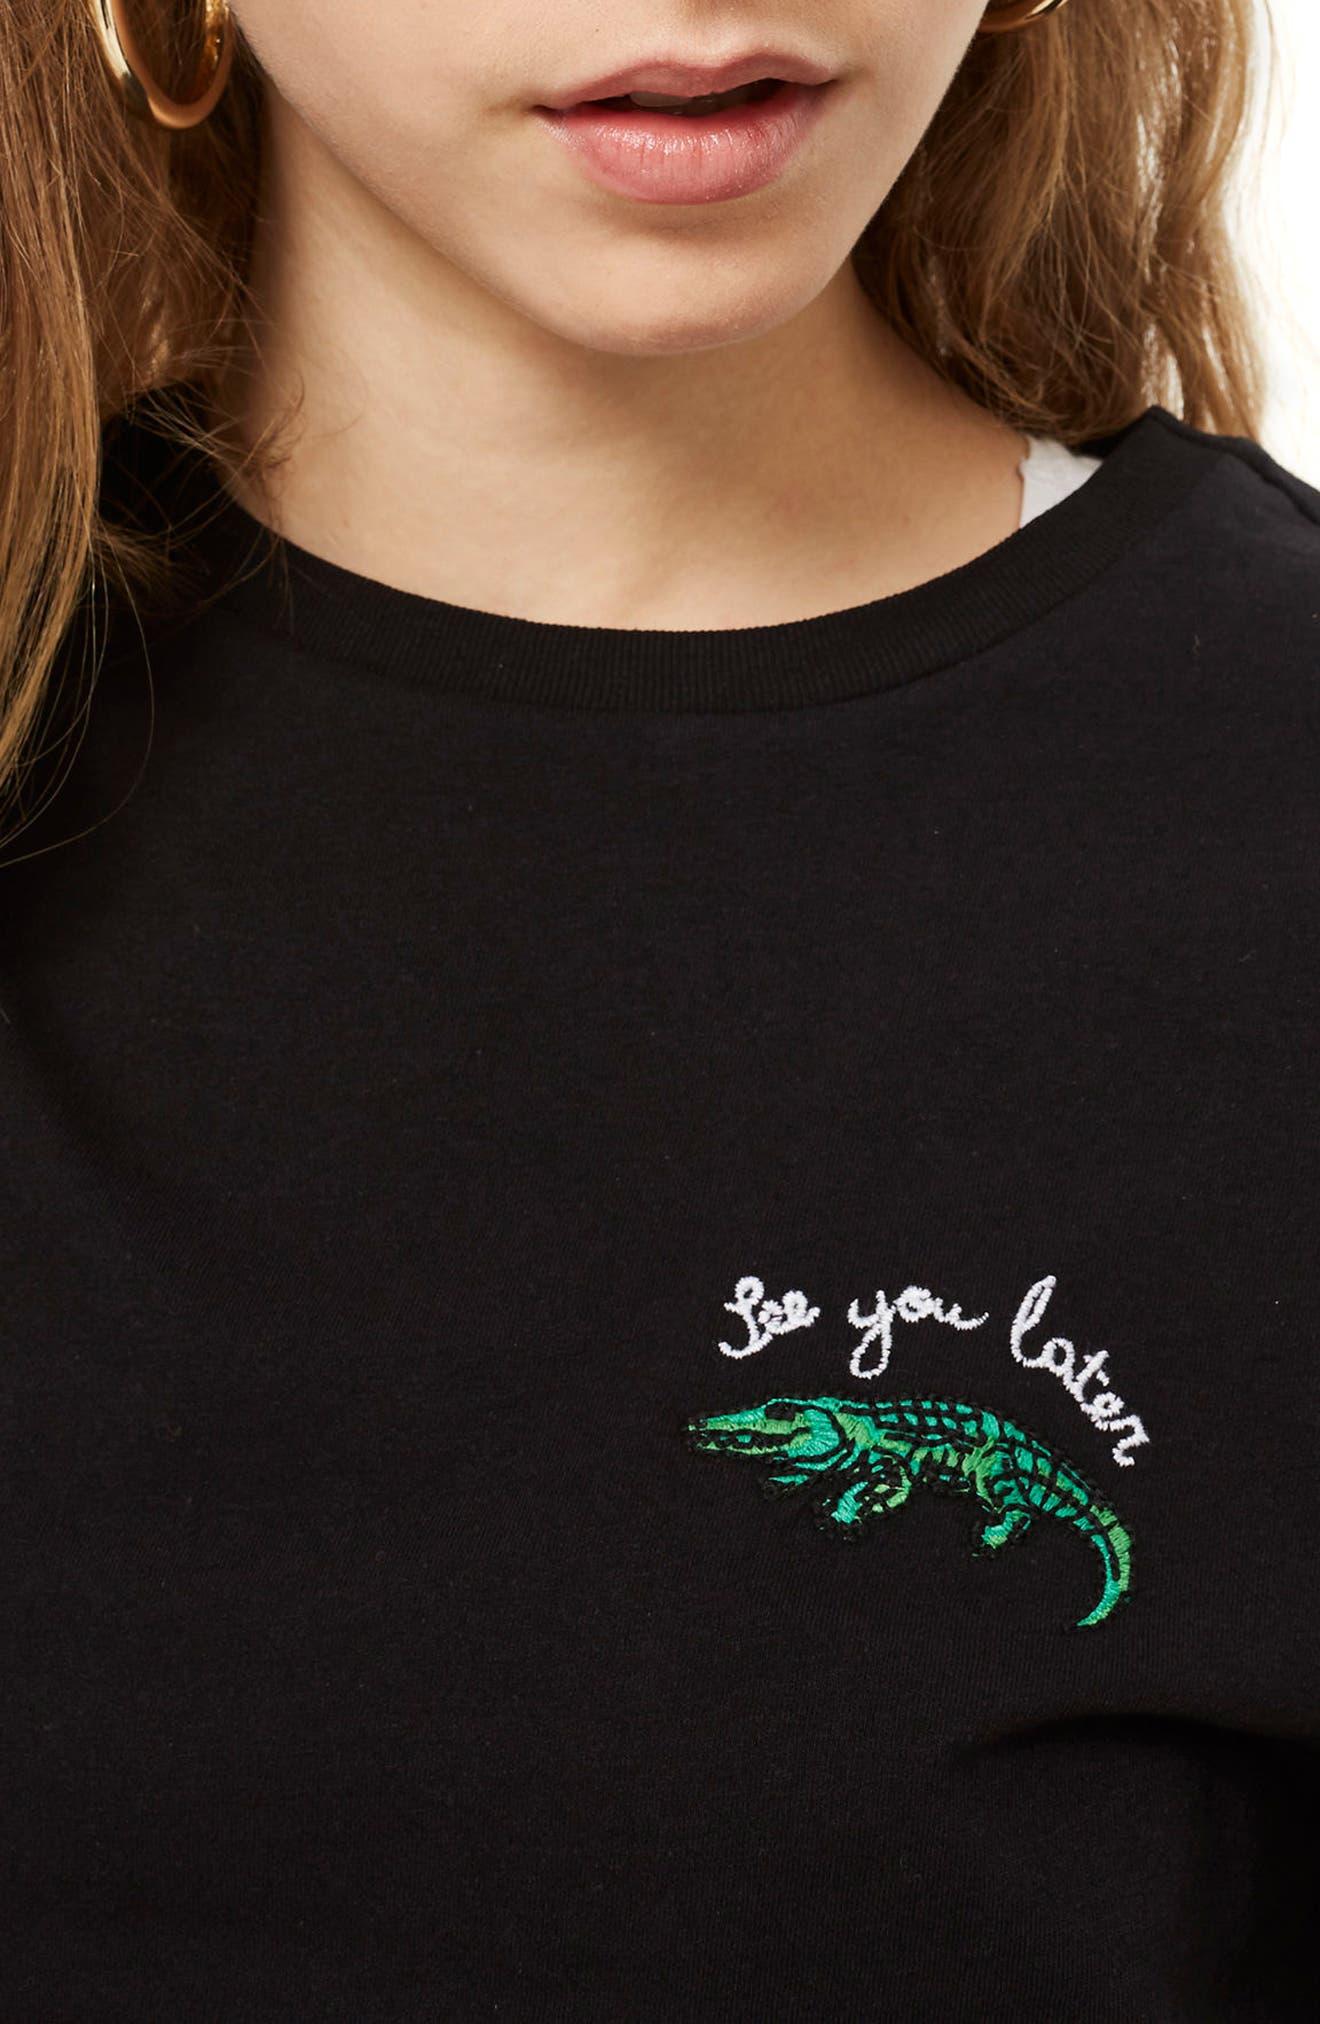 Alligator T-Shirt,                             Alternate thumbnail 3, color,                             002